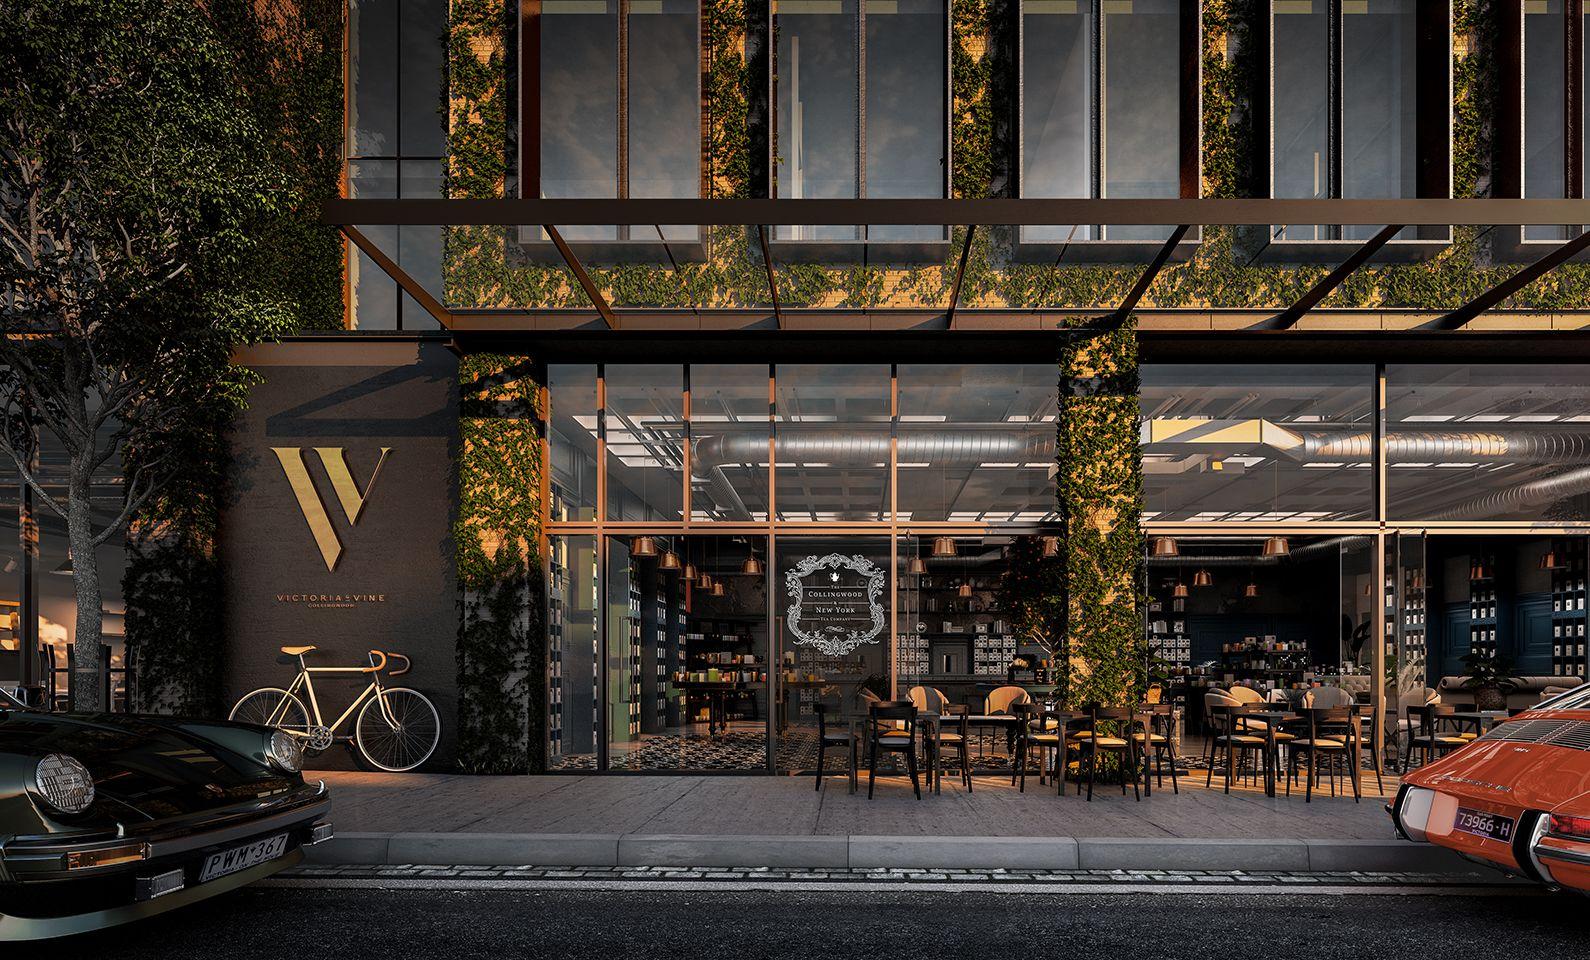 Victoria & Vine   1-57 Wellington Street, Collingwood  Architect: Cox Architecture   Developer: GURNER™                                                                                                 Interior design: David Hicks